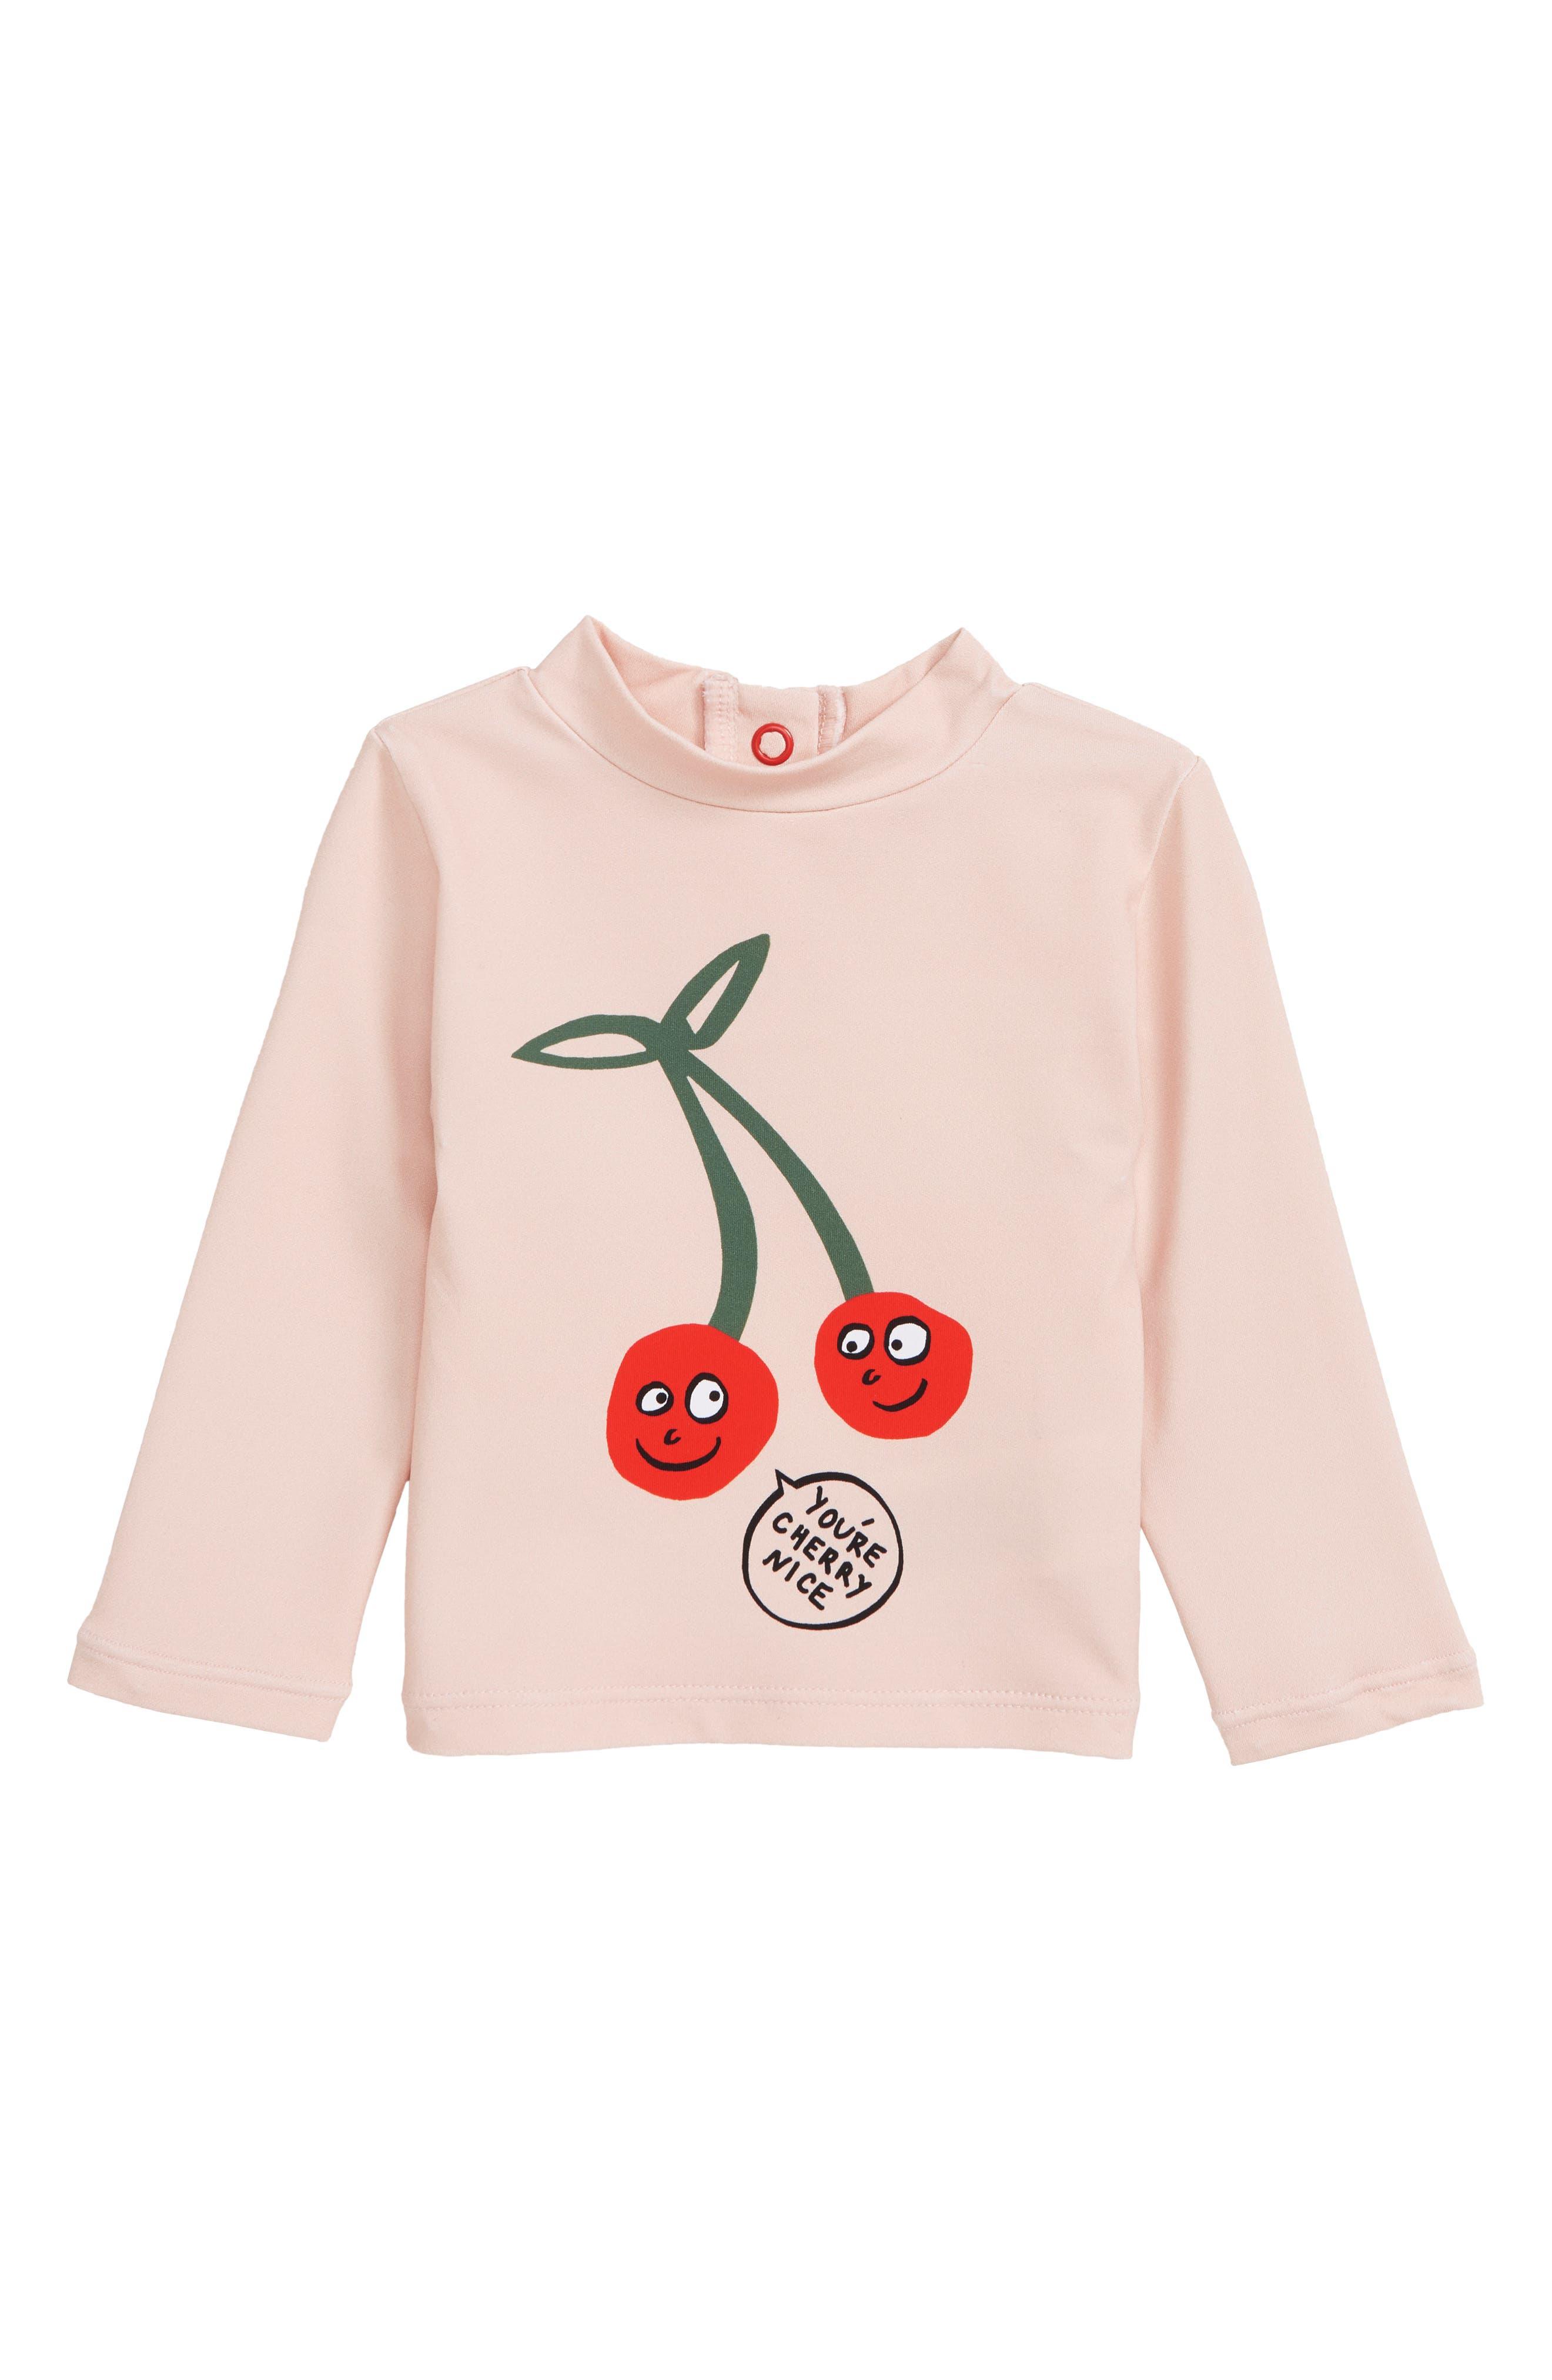 Stella McCartney Cherry Swim Top,                             Main thumbnail 1, color,                             5769 PINK